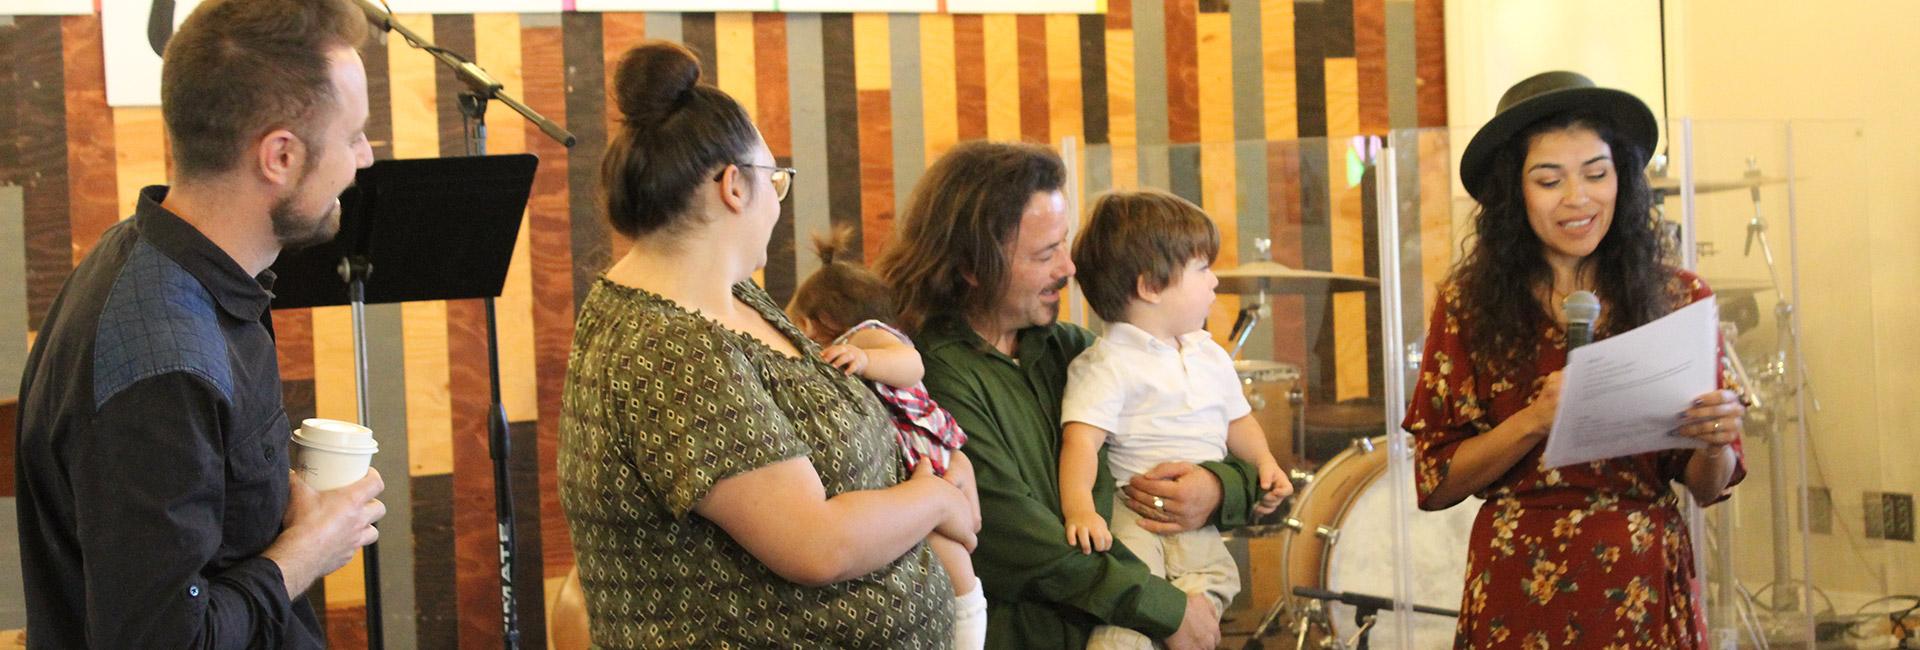 Pastor dedicating child in Ventura Church